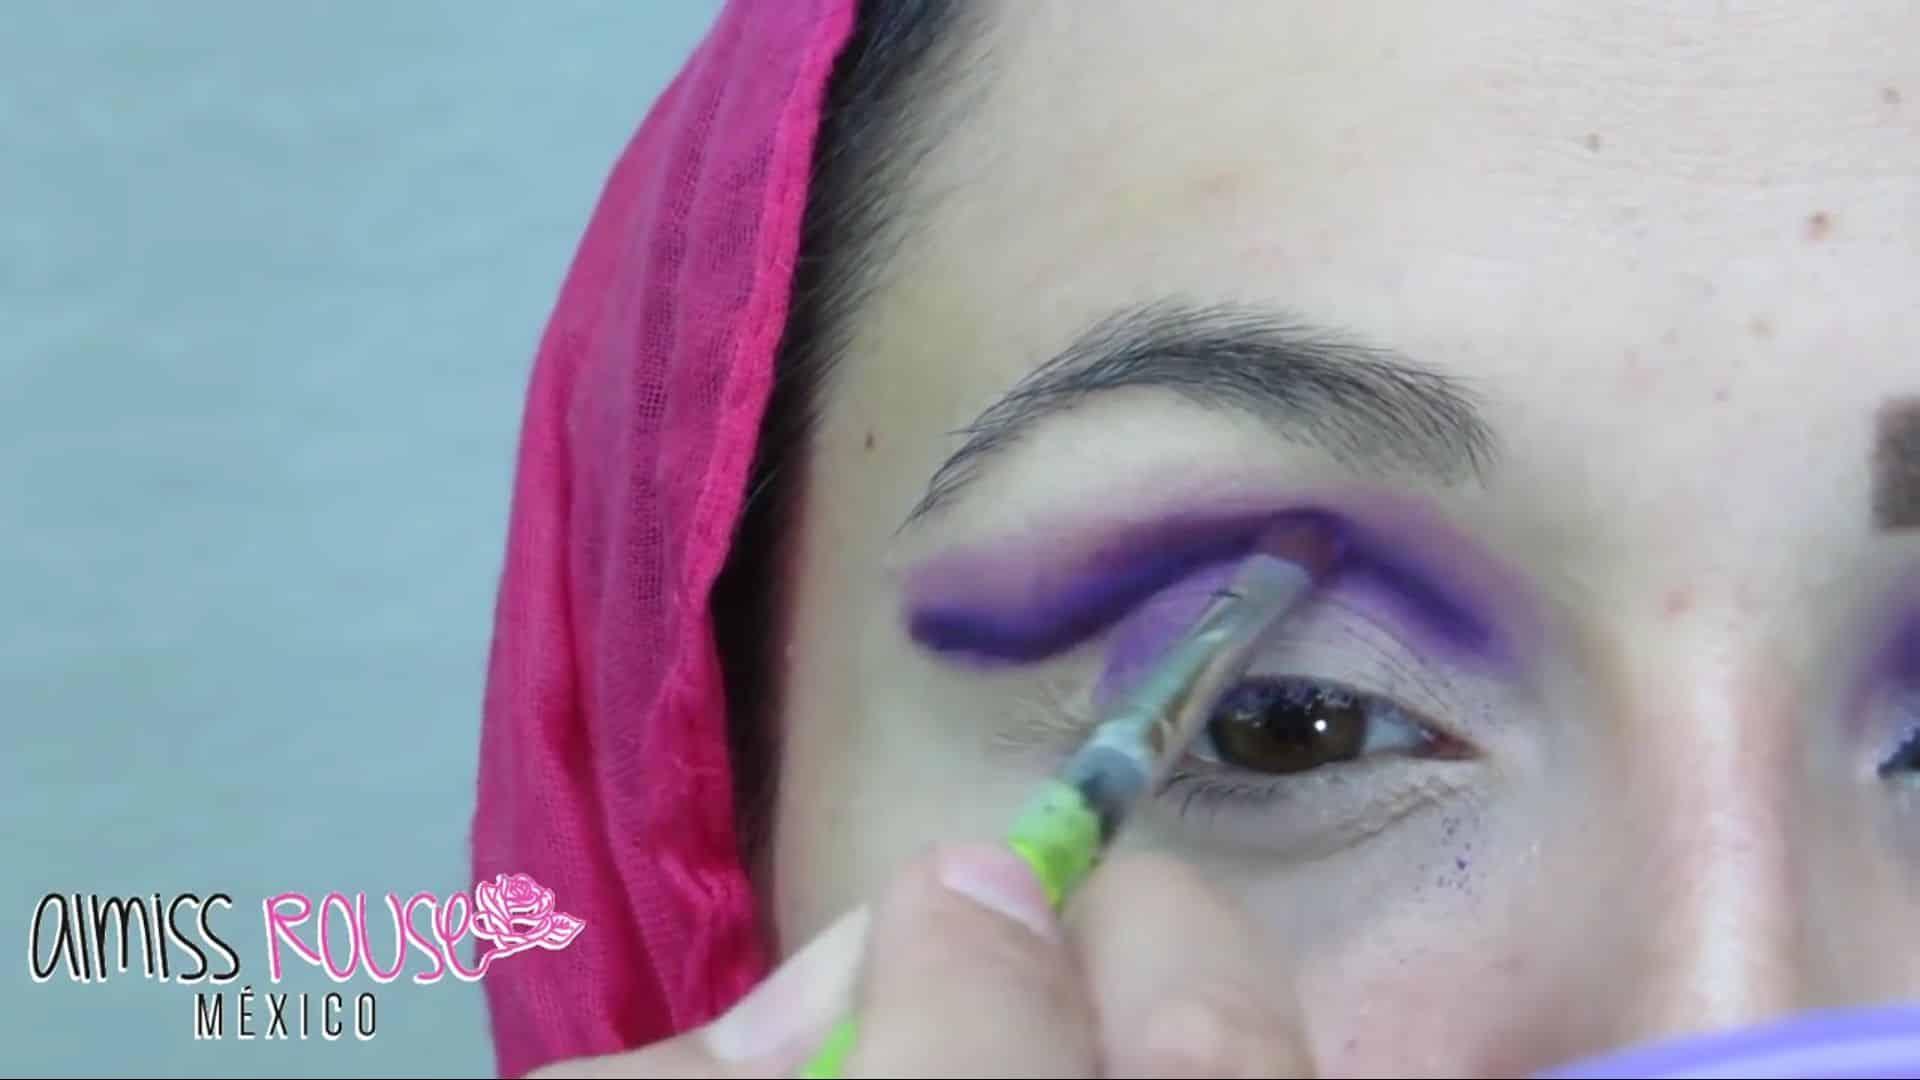 Paso a paso maquillaje Árabe almiss rouse 2020, difuminado de la linea del ojo.